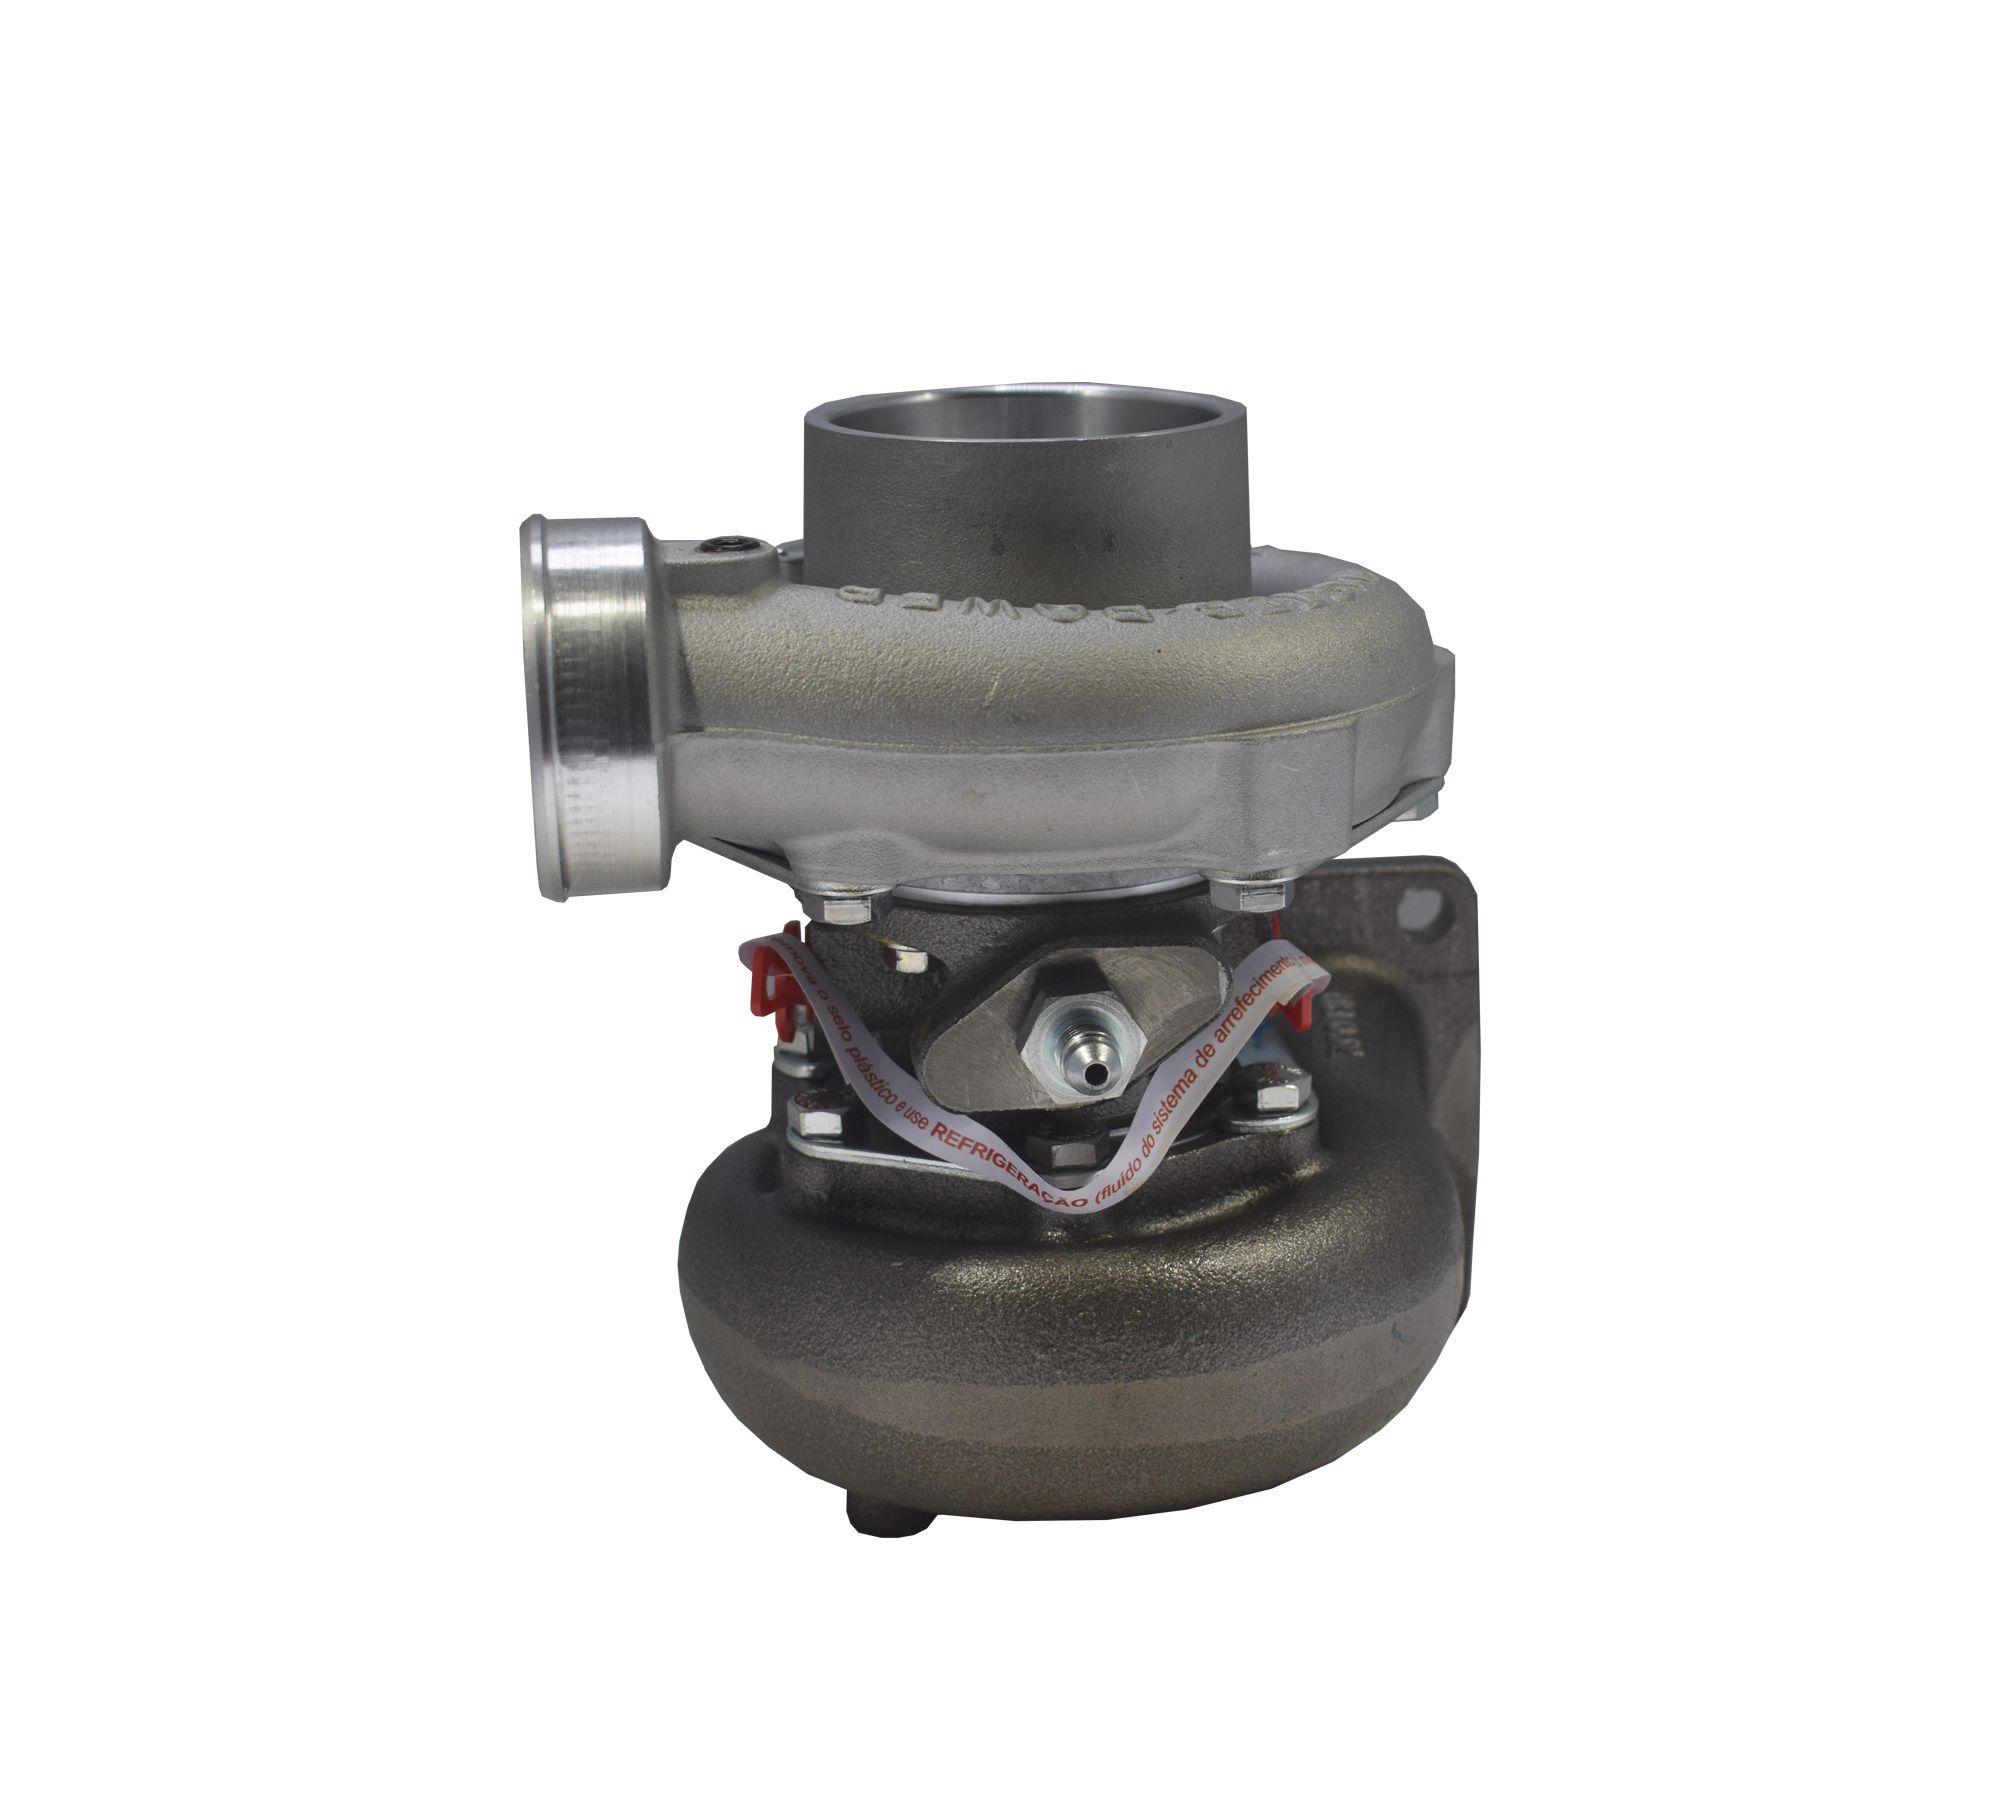 Turbina Roletada / BallBearing Master Power - RB 494 48. Valvulada